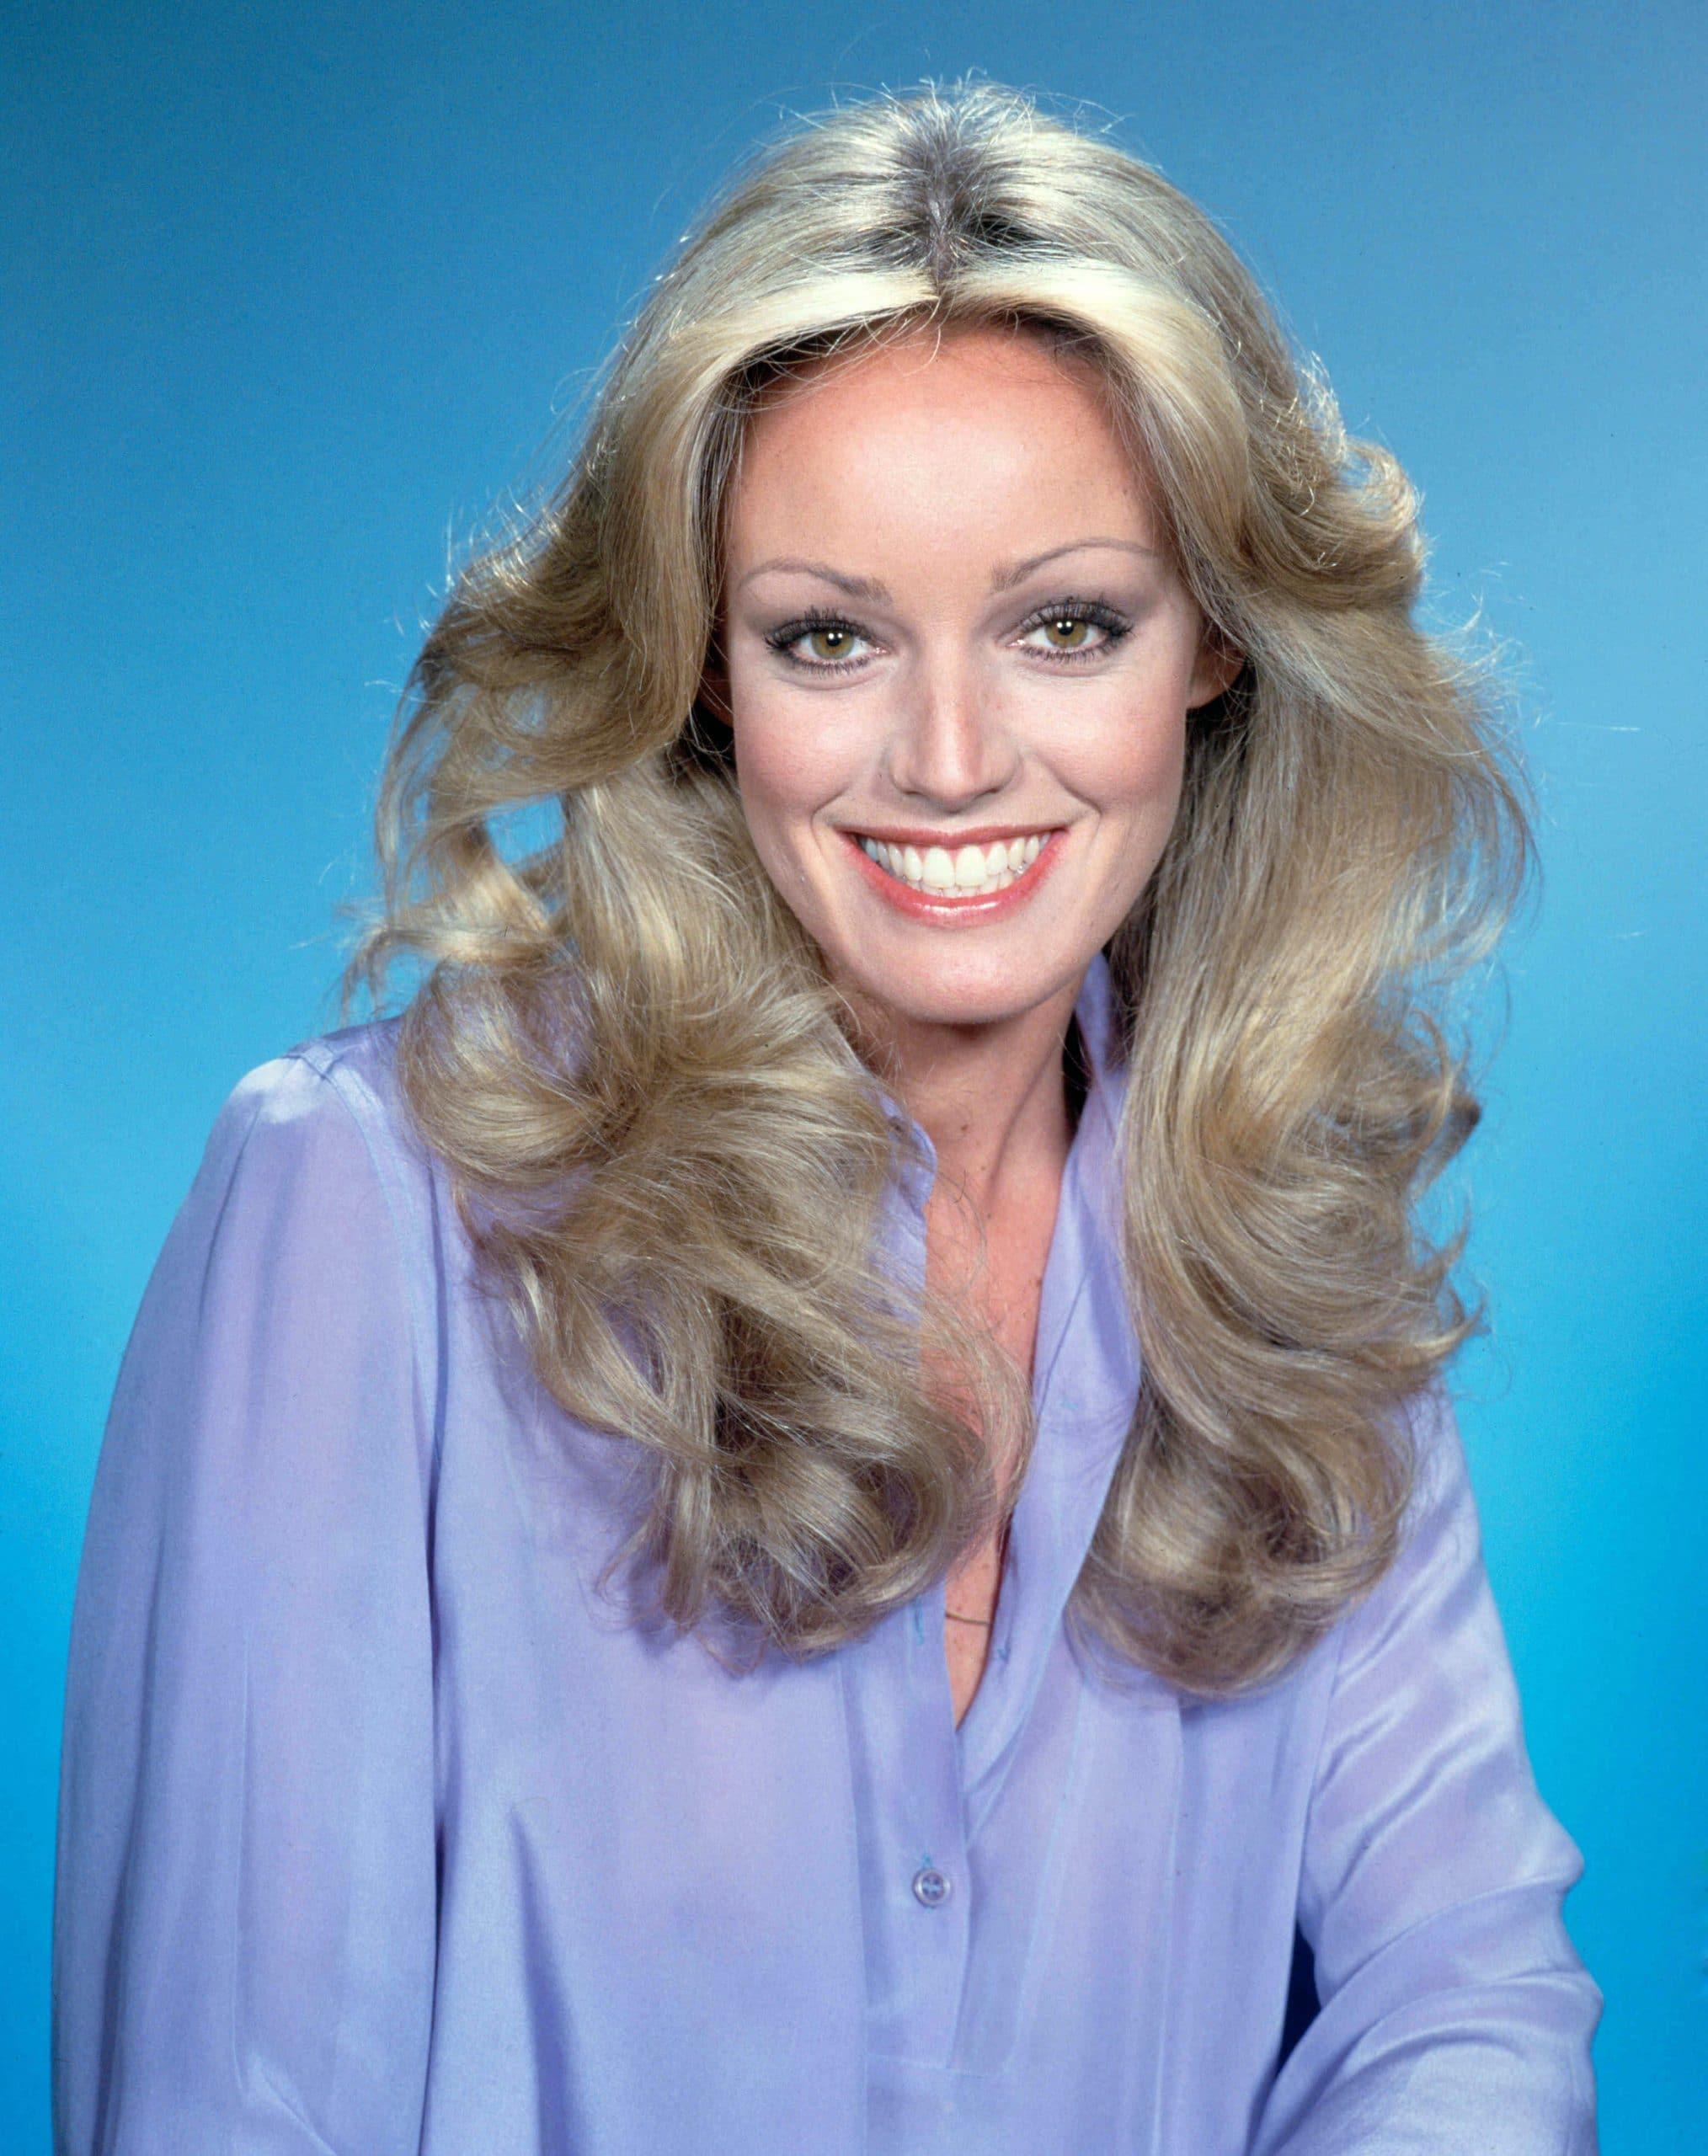 Susan Anton, 1970s